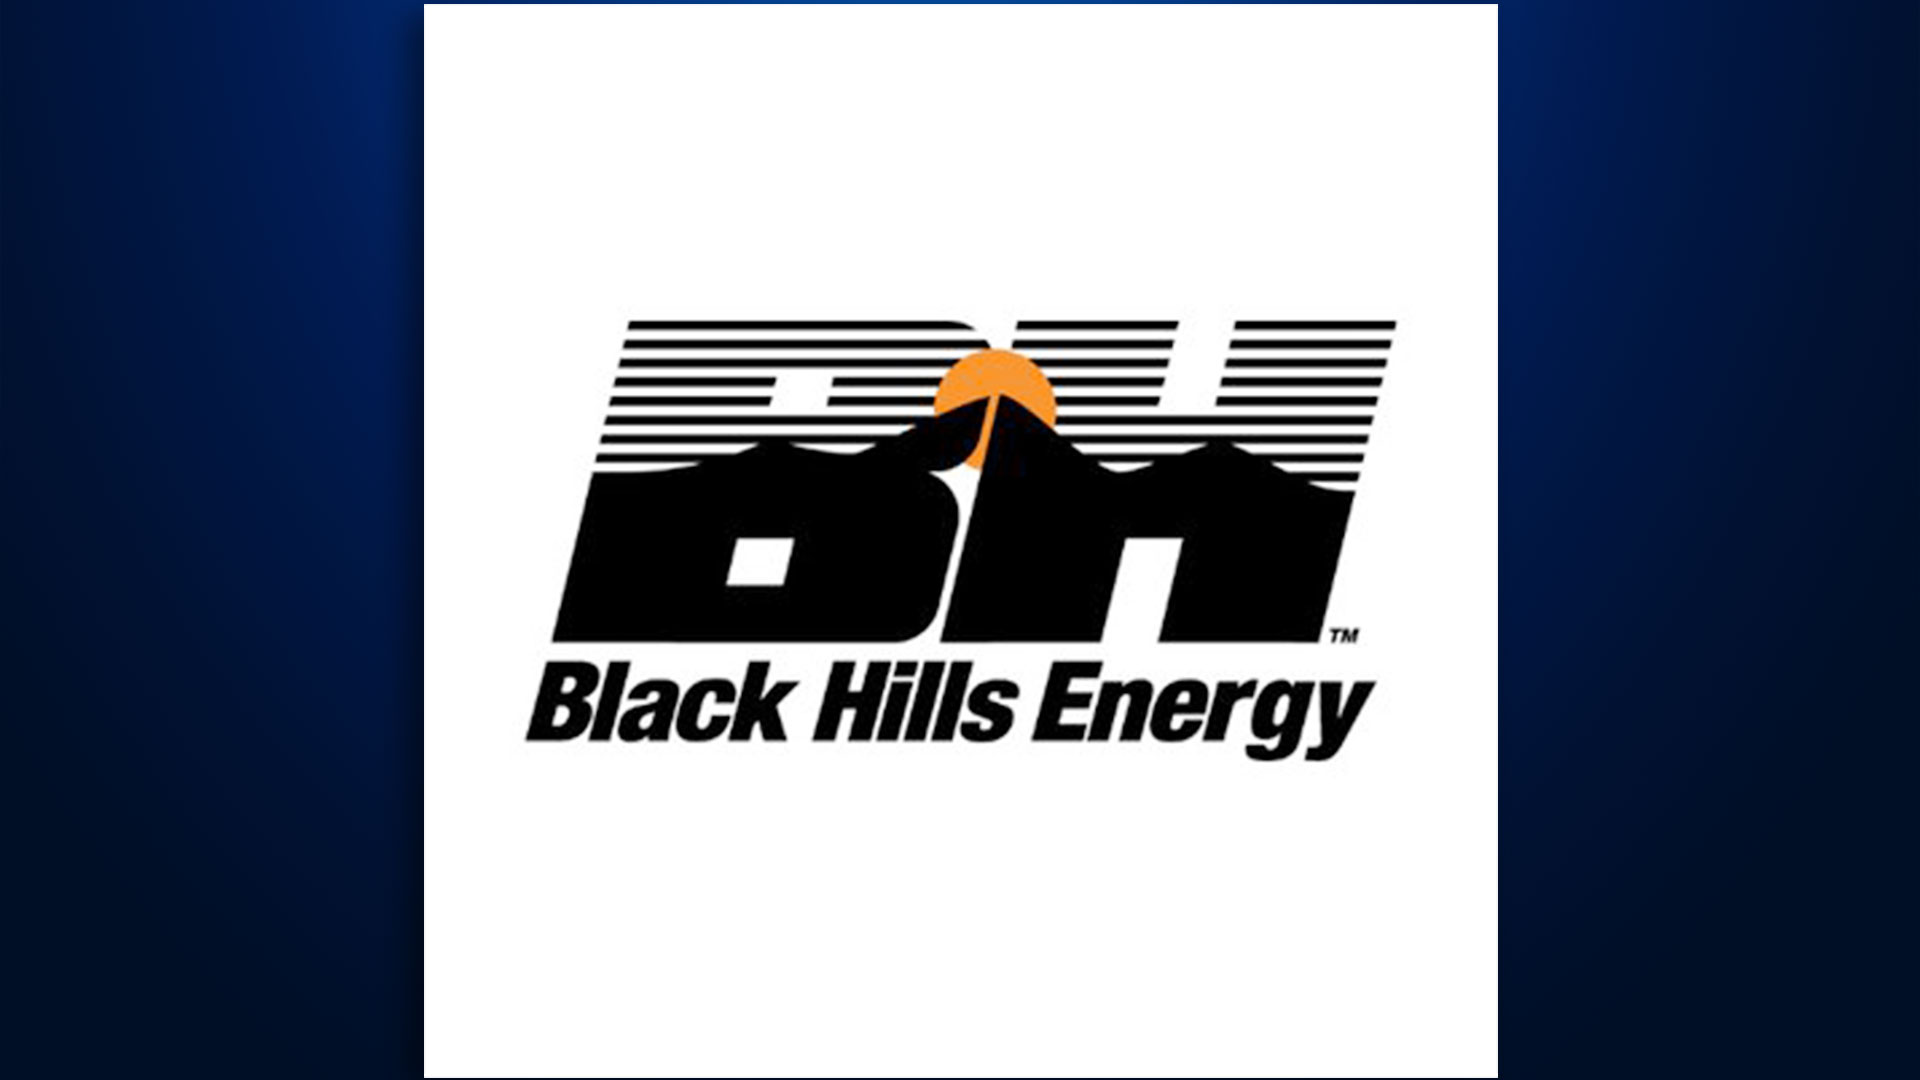 KELO Black Hills Energy